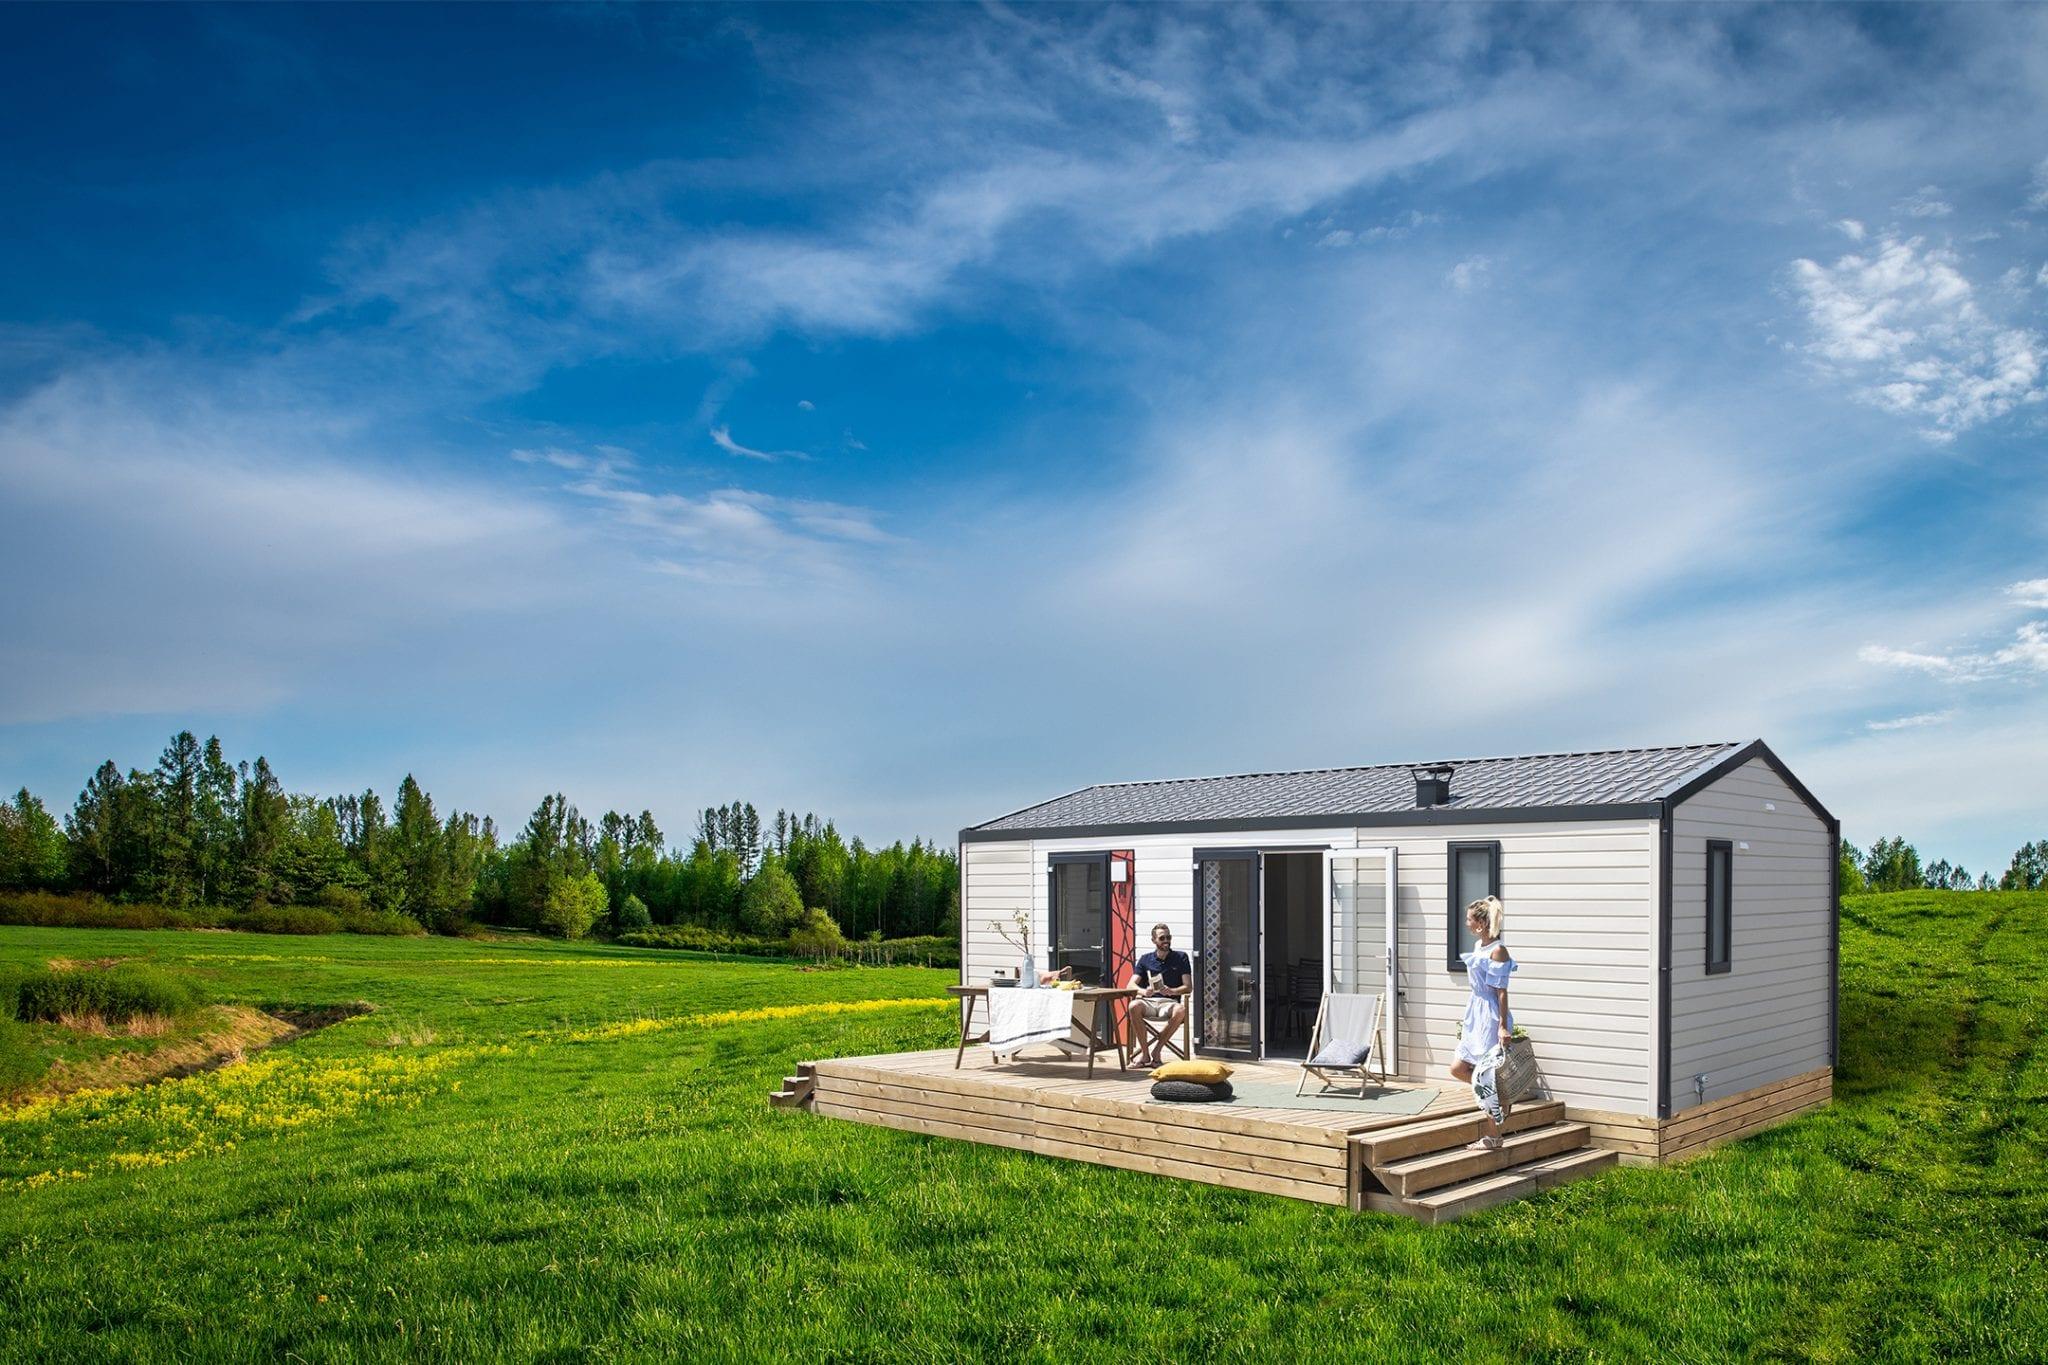 RIDOREV BAHIA DUO - Mobil home neuf - 2020 - Zen Mobil homes